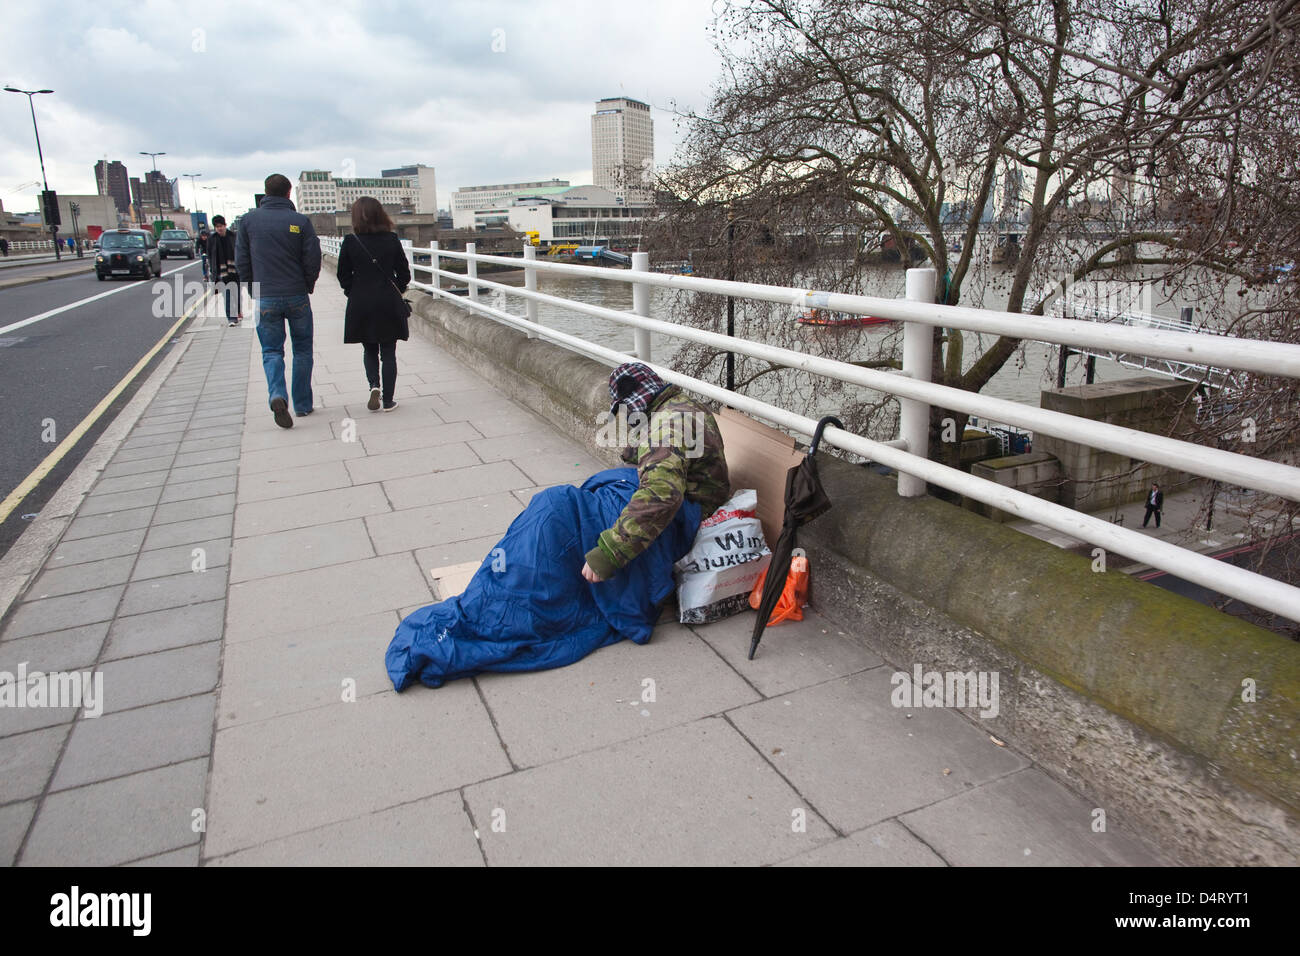 Homme sans domicile sur Waterloo Bridge, Londres, Angleterre, RU Photo Stock